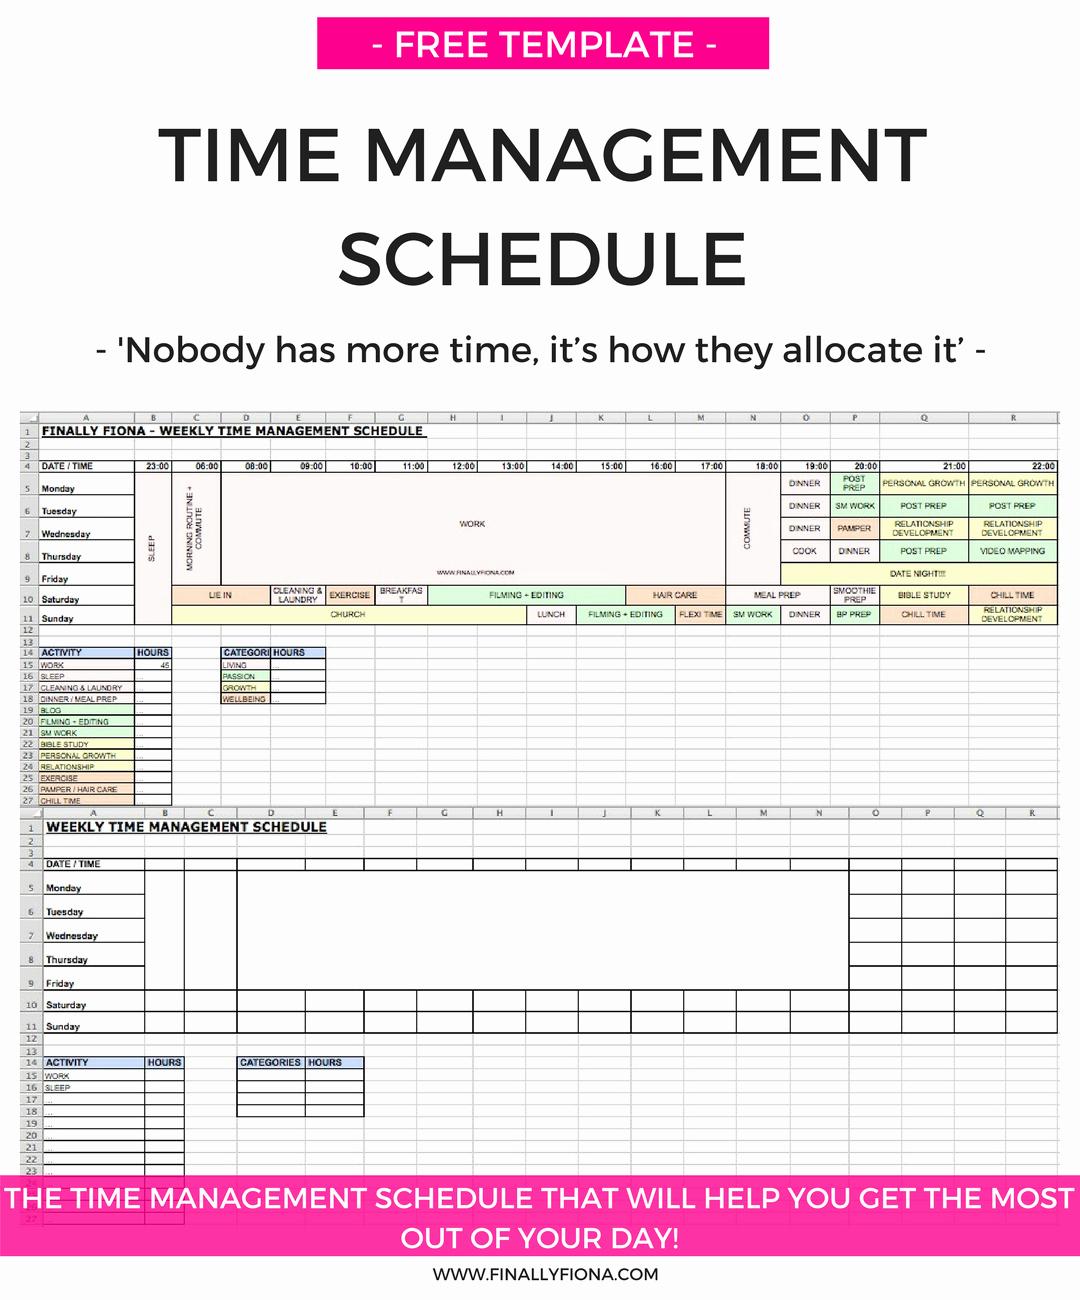 Time Management Schedule Template Unique My Time Management Schedule & How I Get the Most Out Of